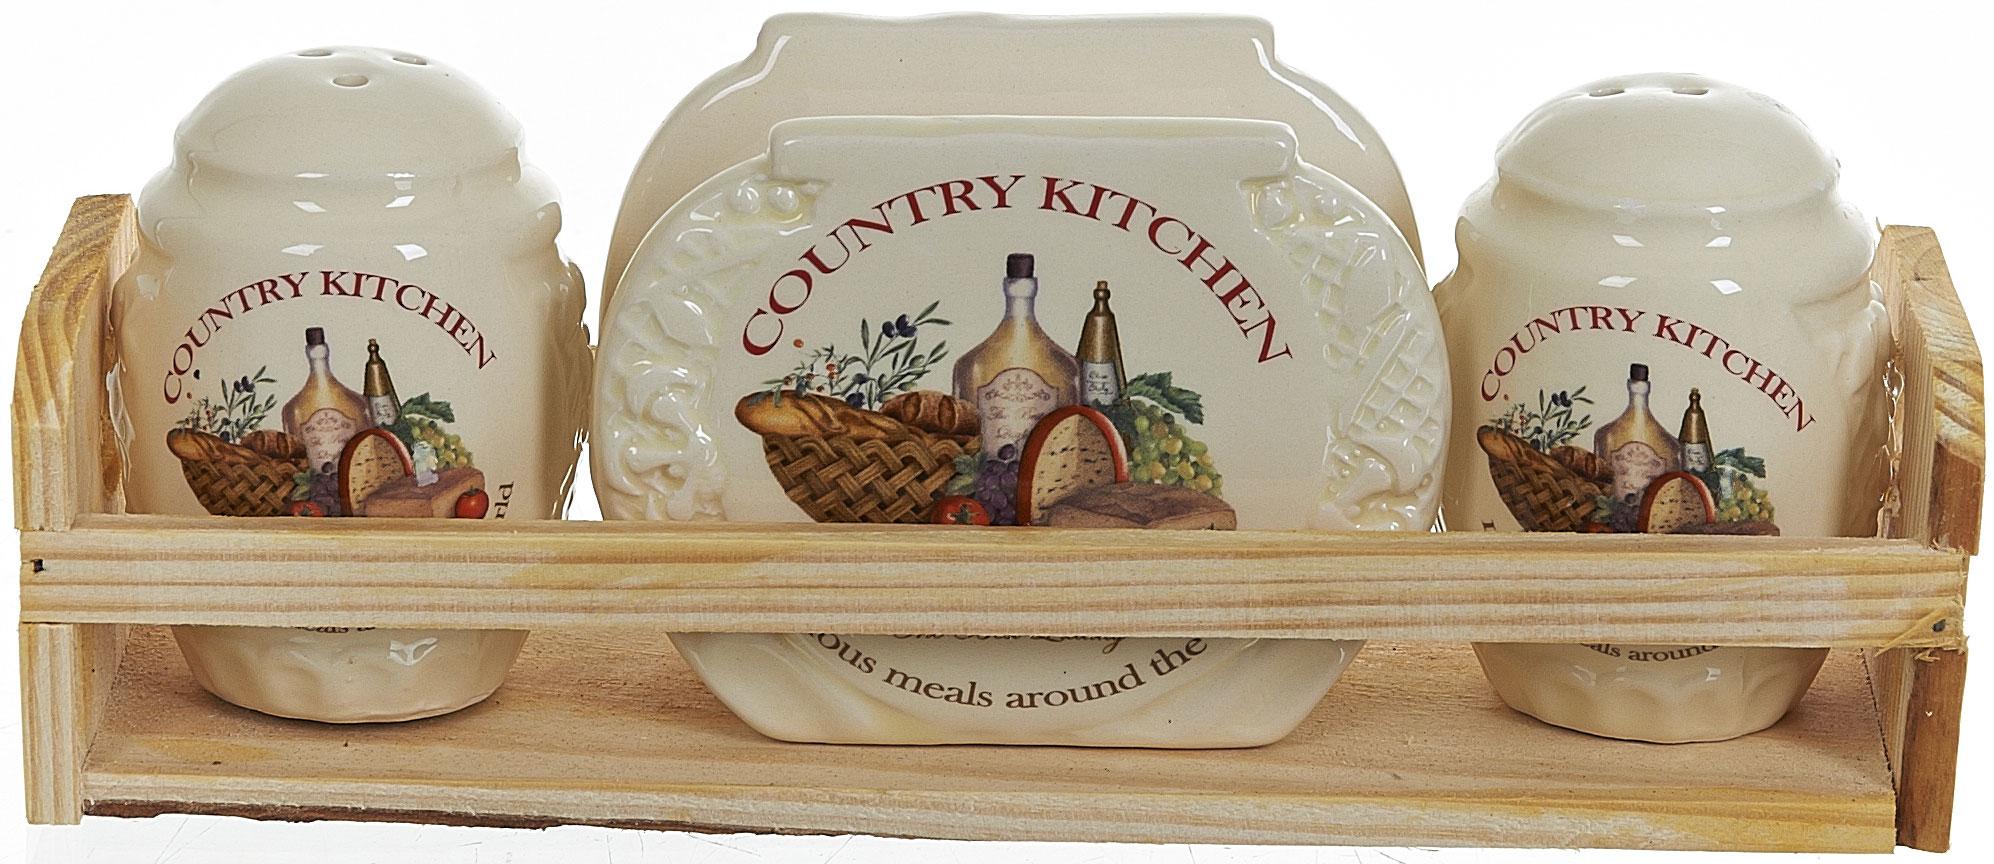 Набор для специй Polystar Country Kitchen, 4 предмета набор для специй polystar harmony 4 предмета